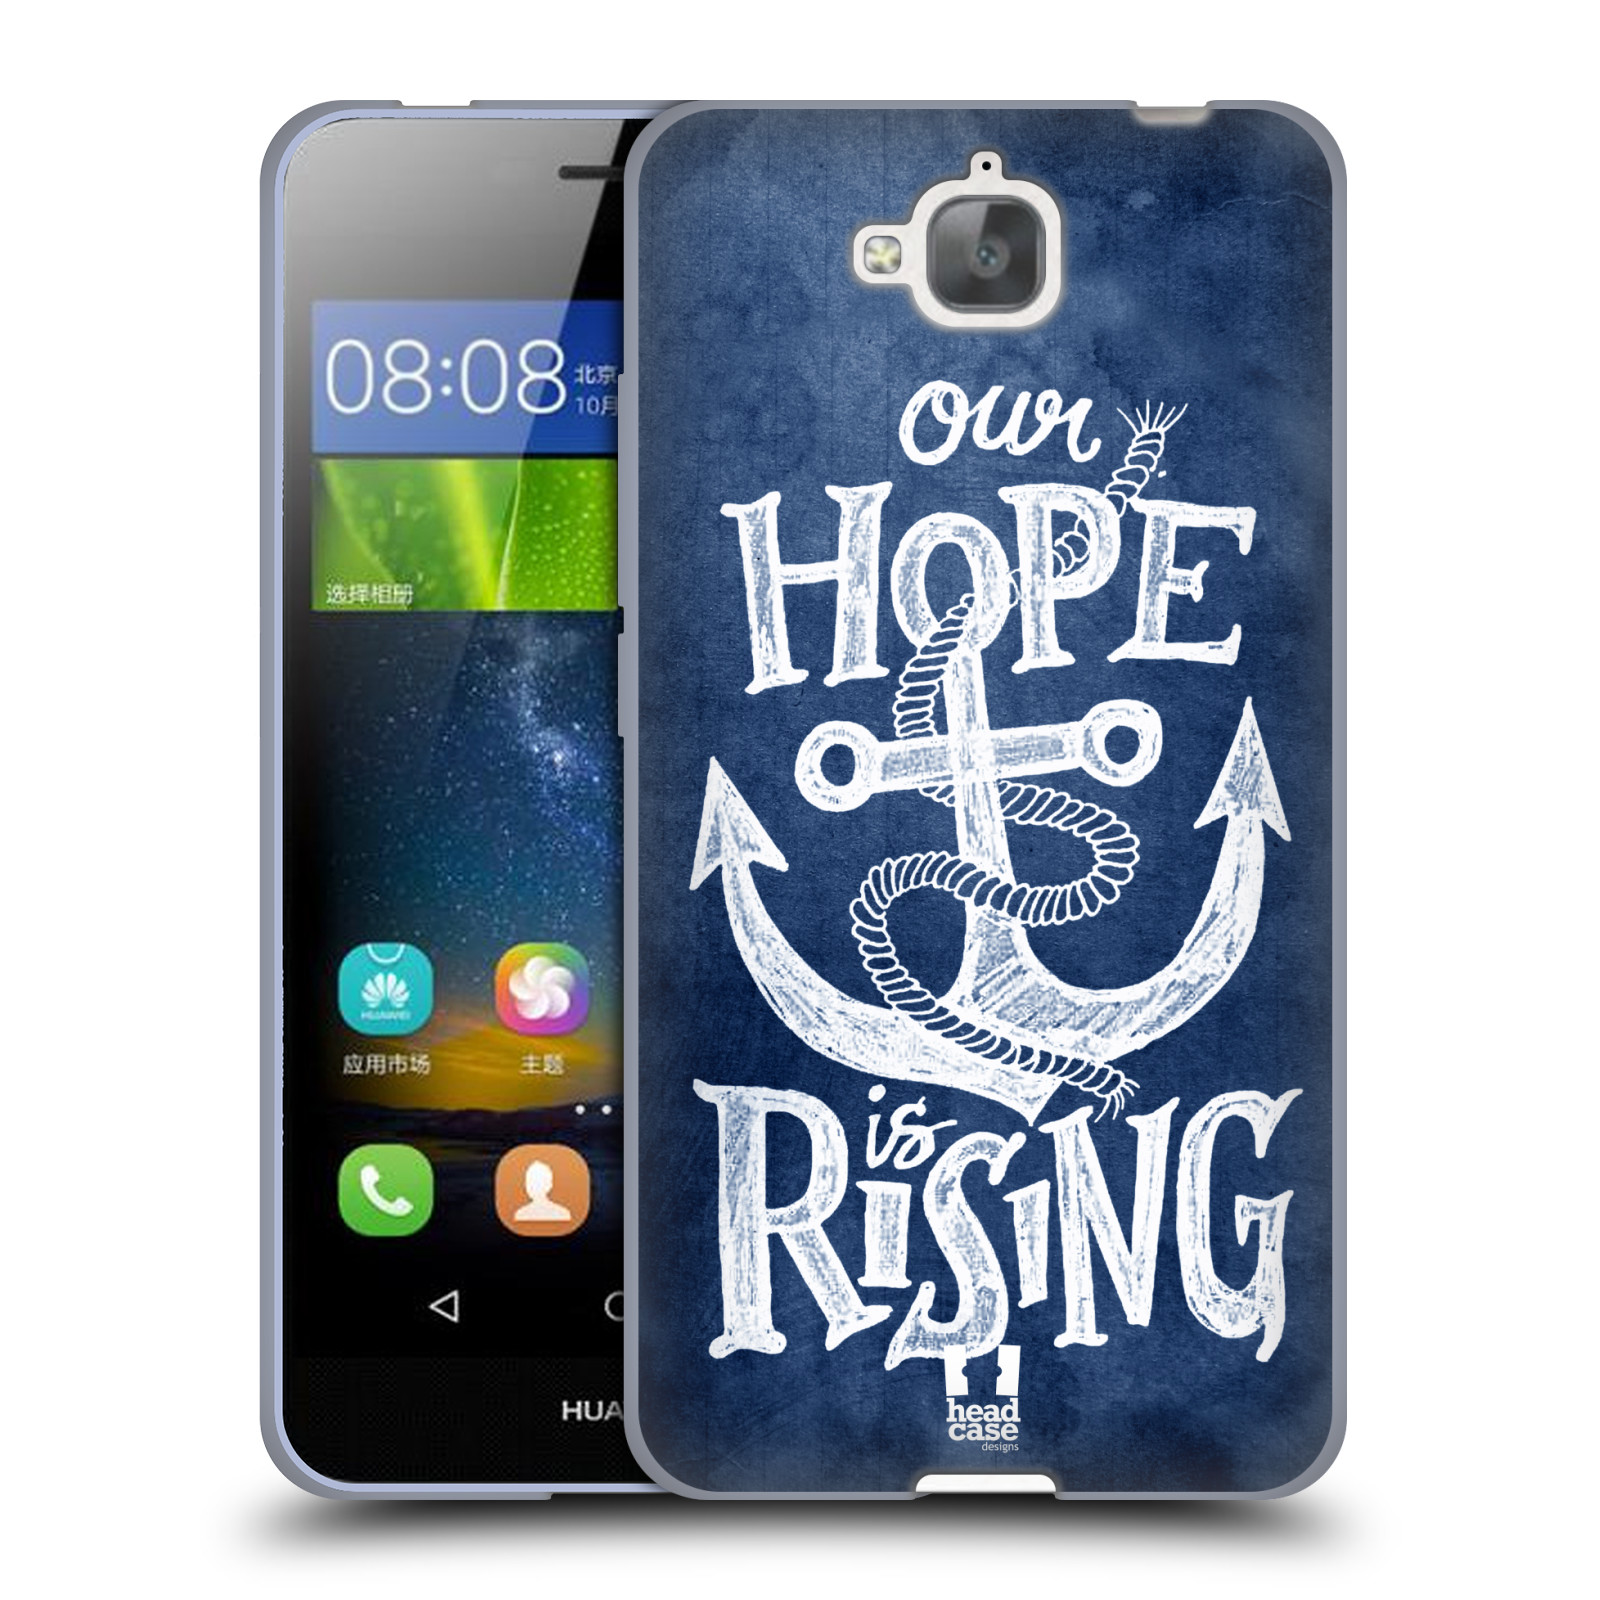 Silikonové pouzdro na mobil Huawei Y6 Pro Dual Sim HEAD CASE KOTVA RISING